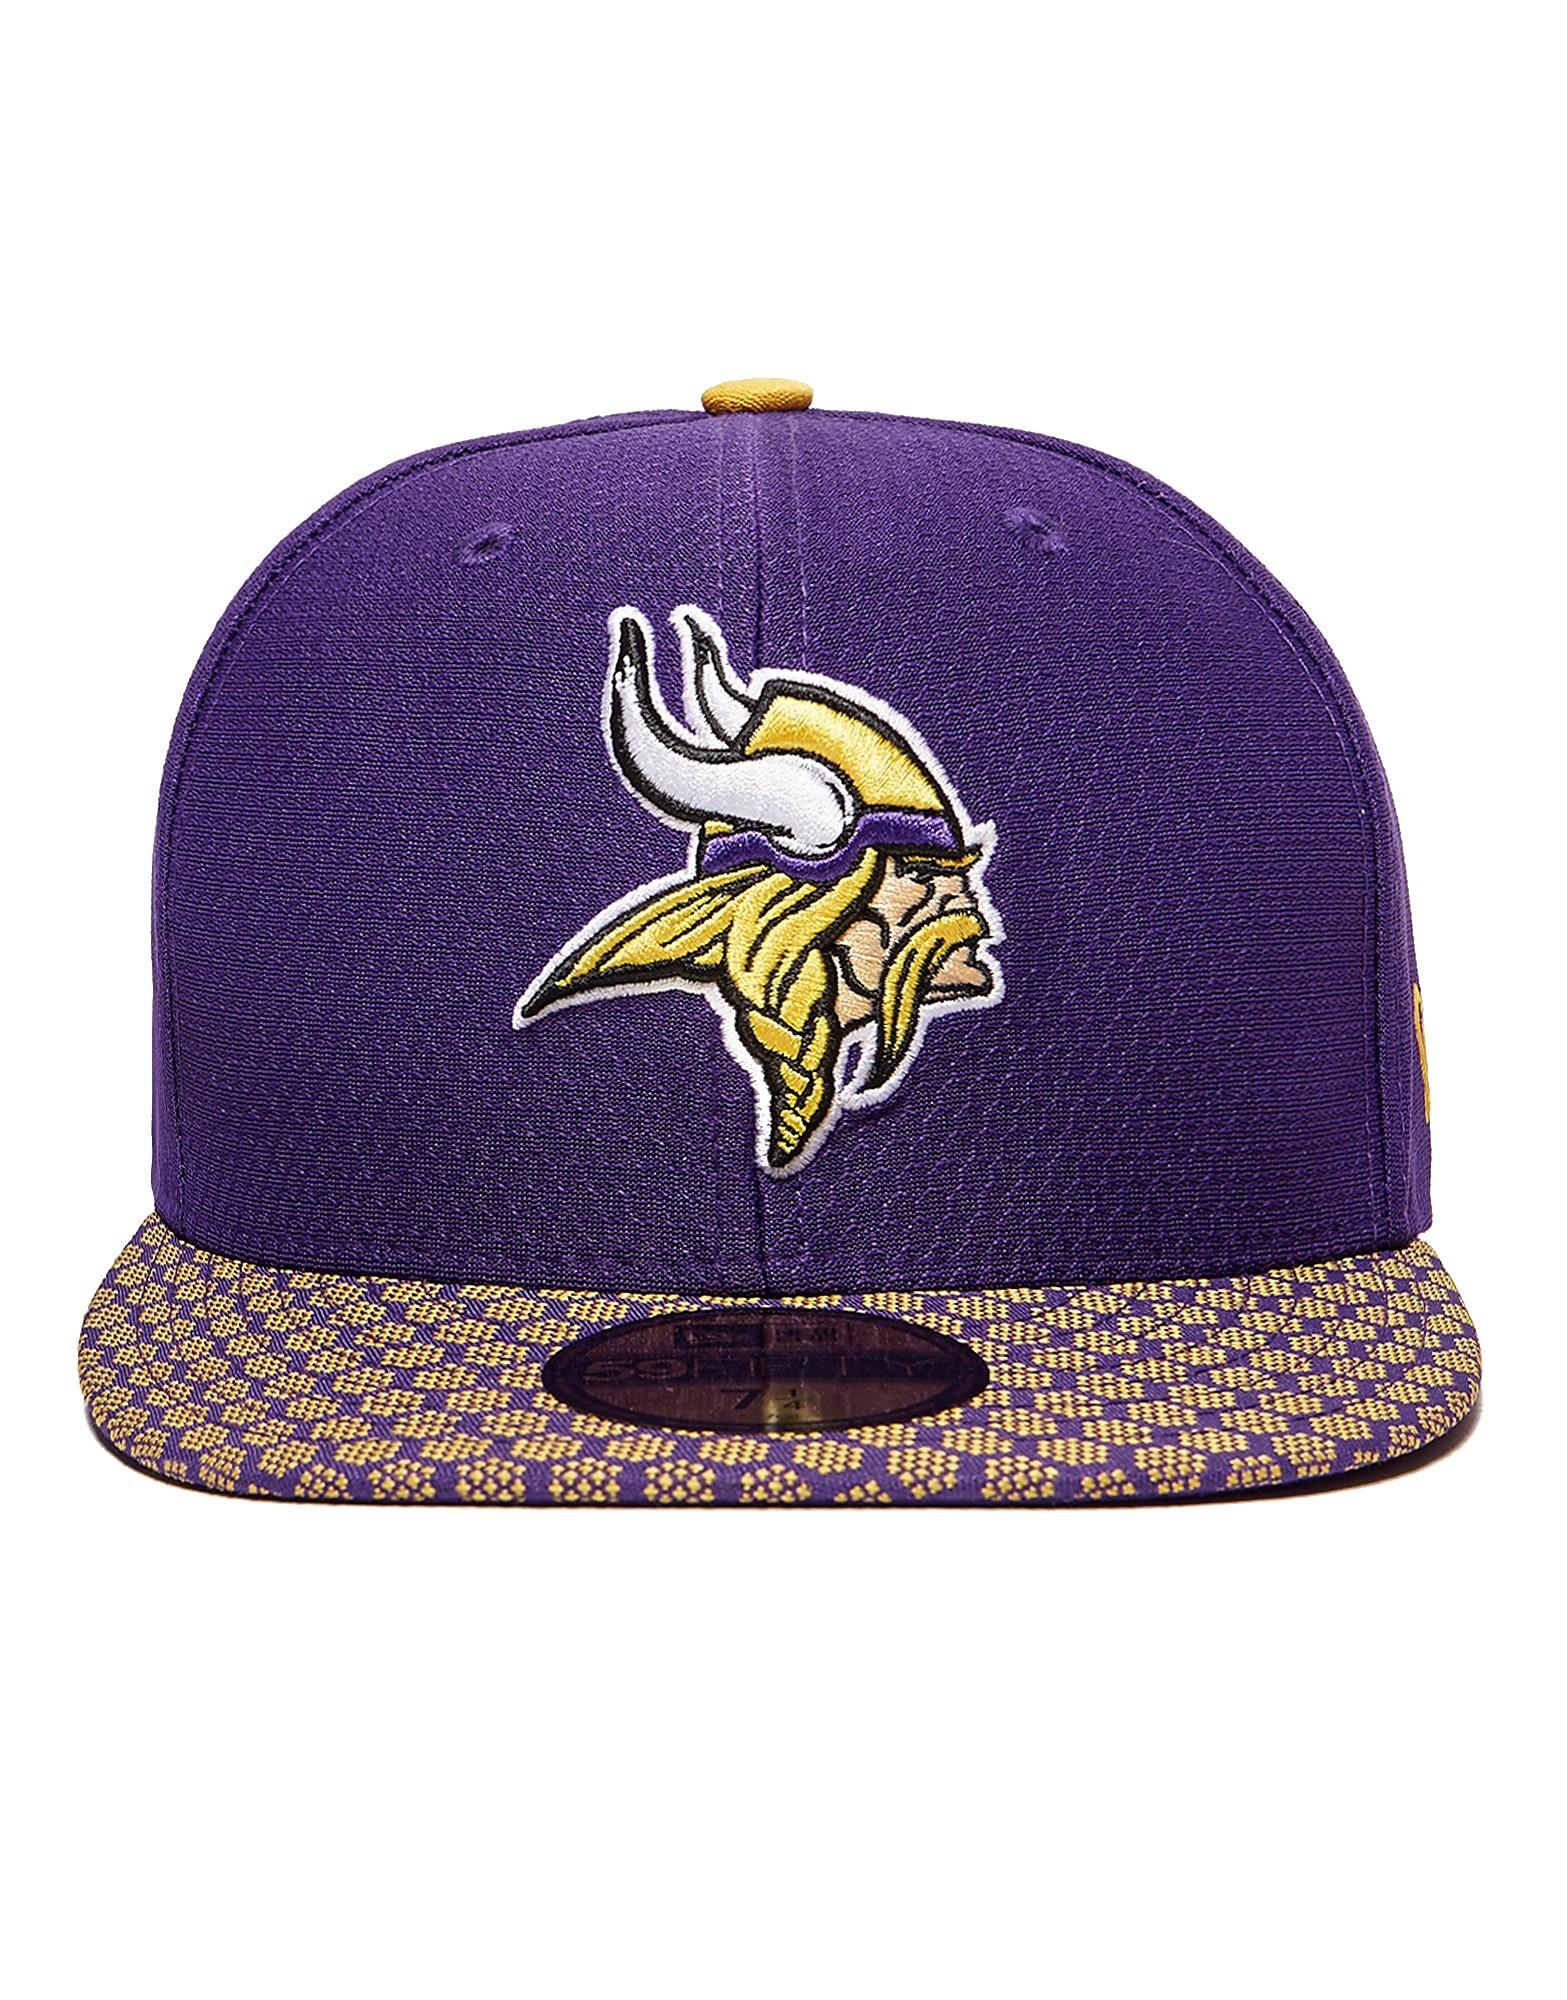 New Era NFL Minnesota Vikings 59Fifty Cap